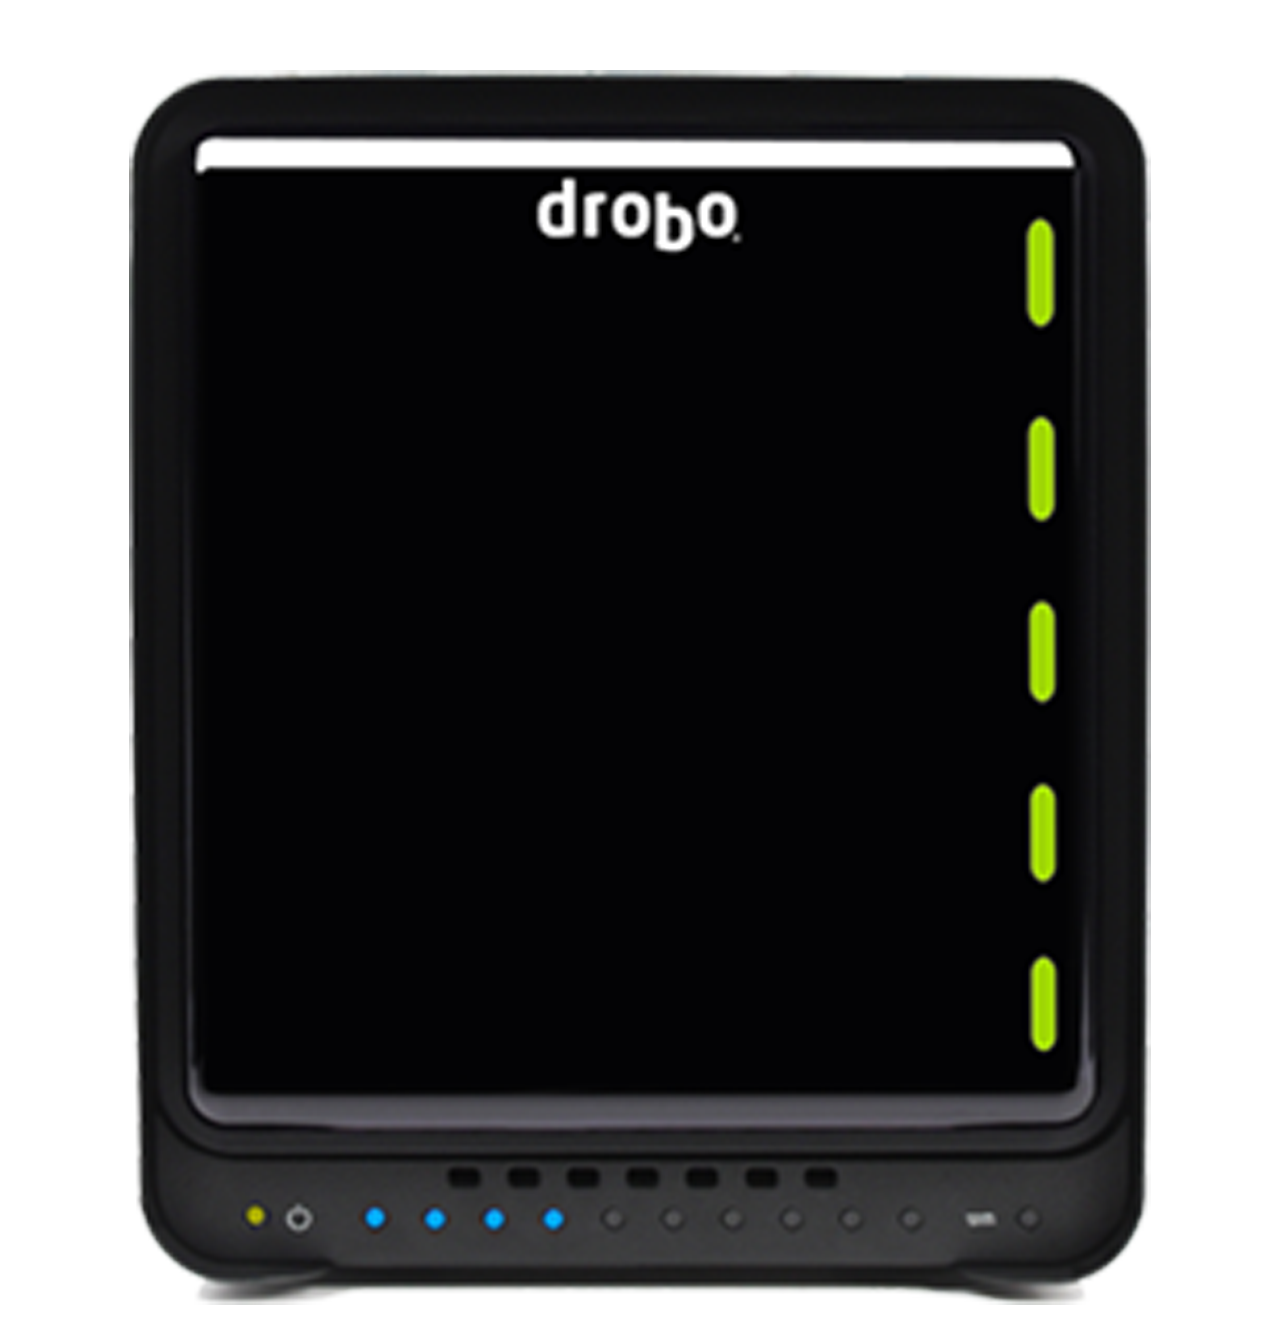 Drobo 5C USB3.0接口 智能BeyondRAID 磁盘阵列 5位盘 内置电池